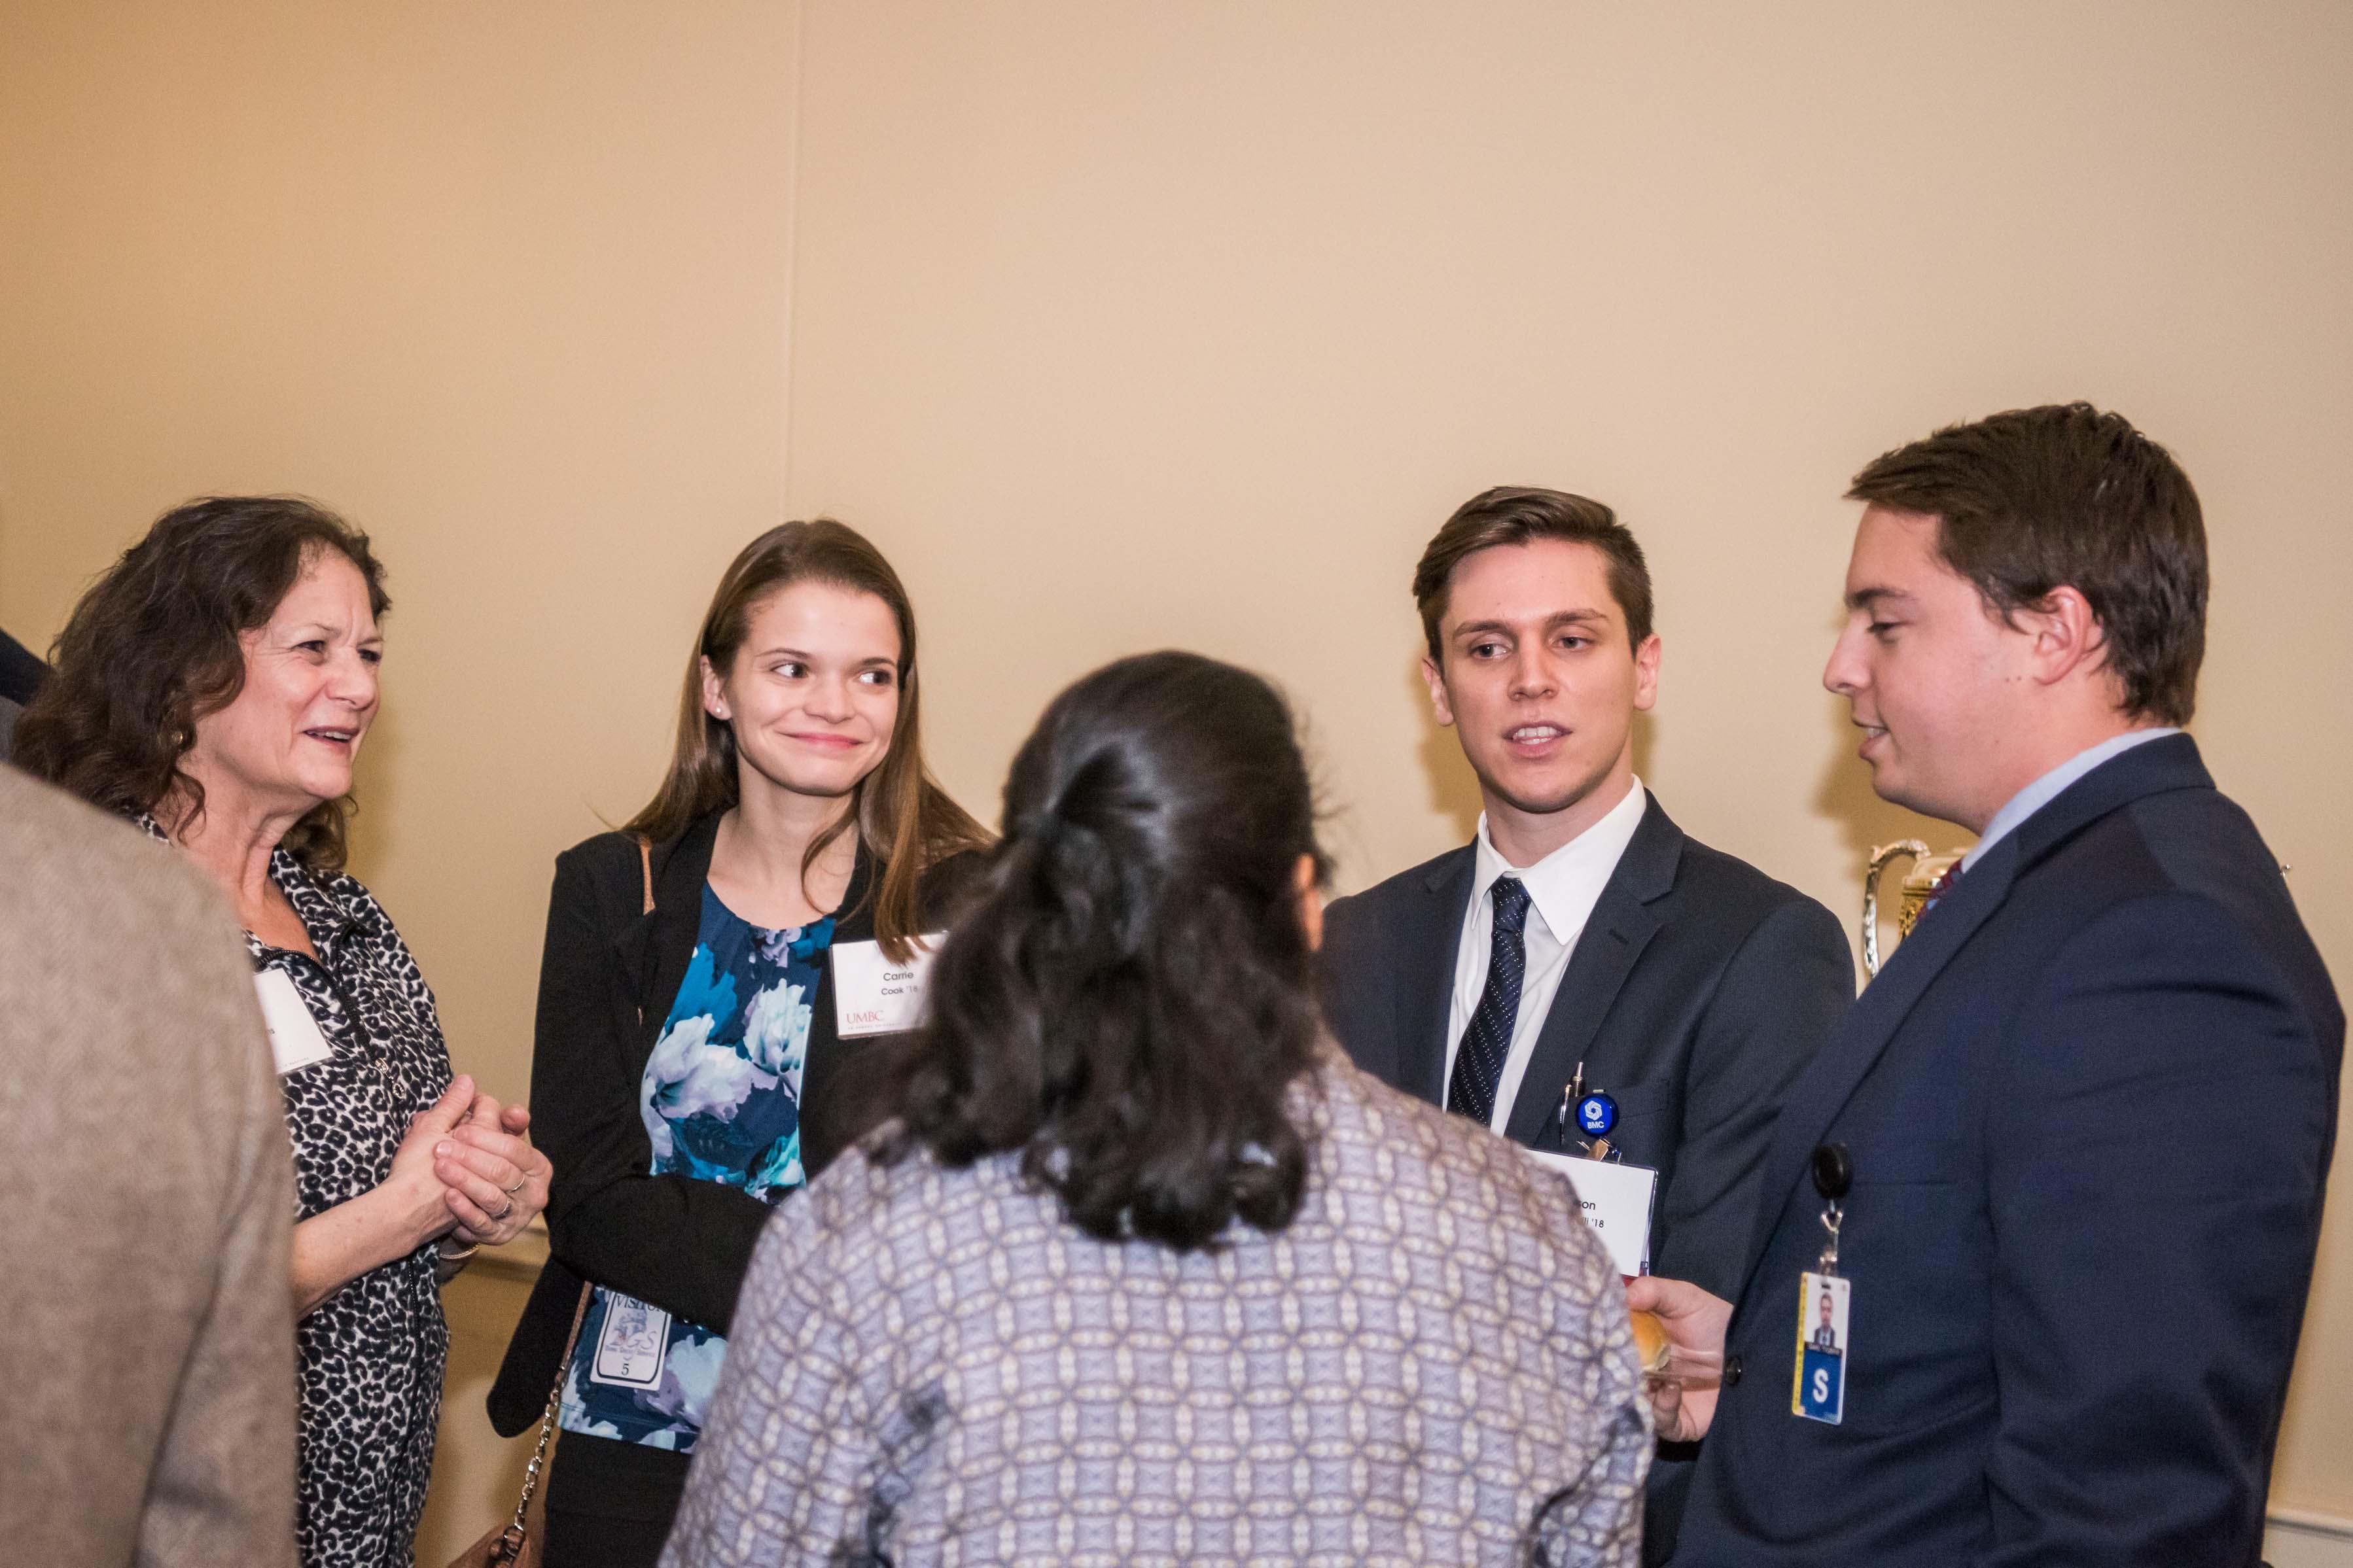 Group talk at Annapolis Alumni reception